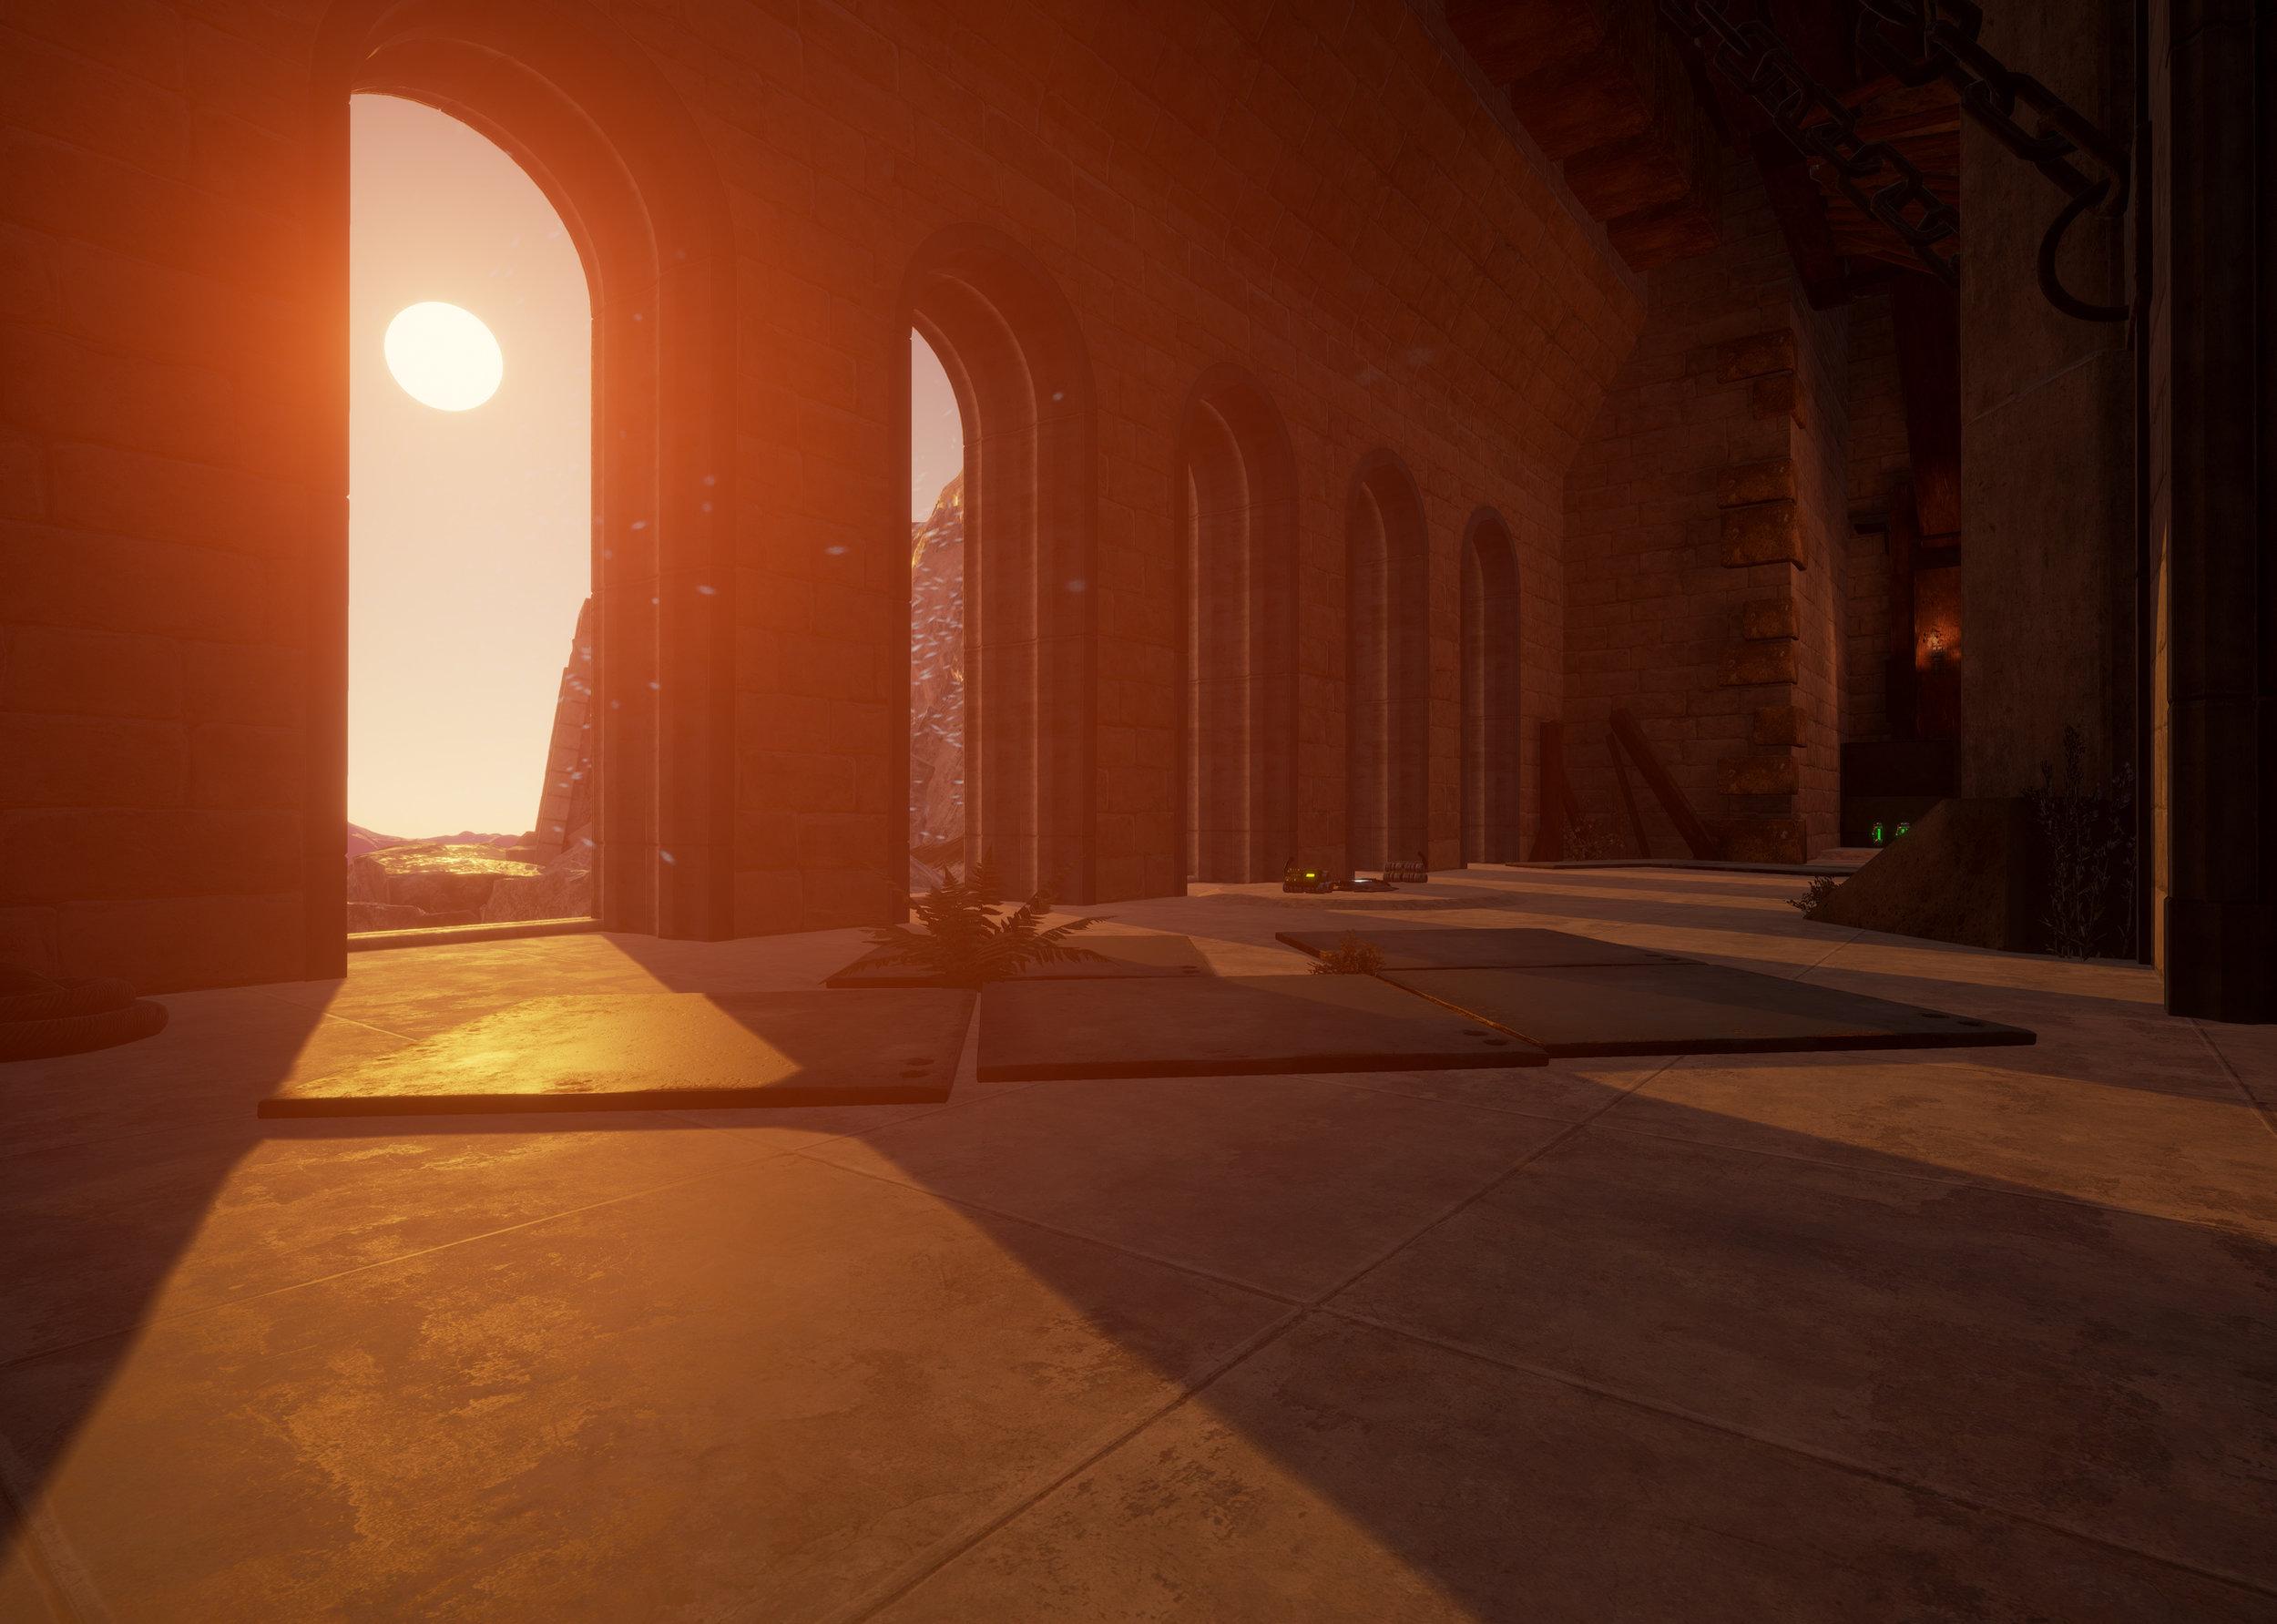 archer-remastered_screenshot-4.jpg